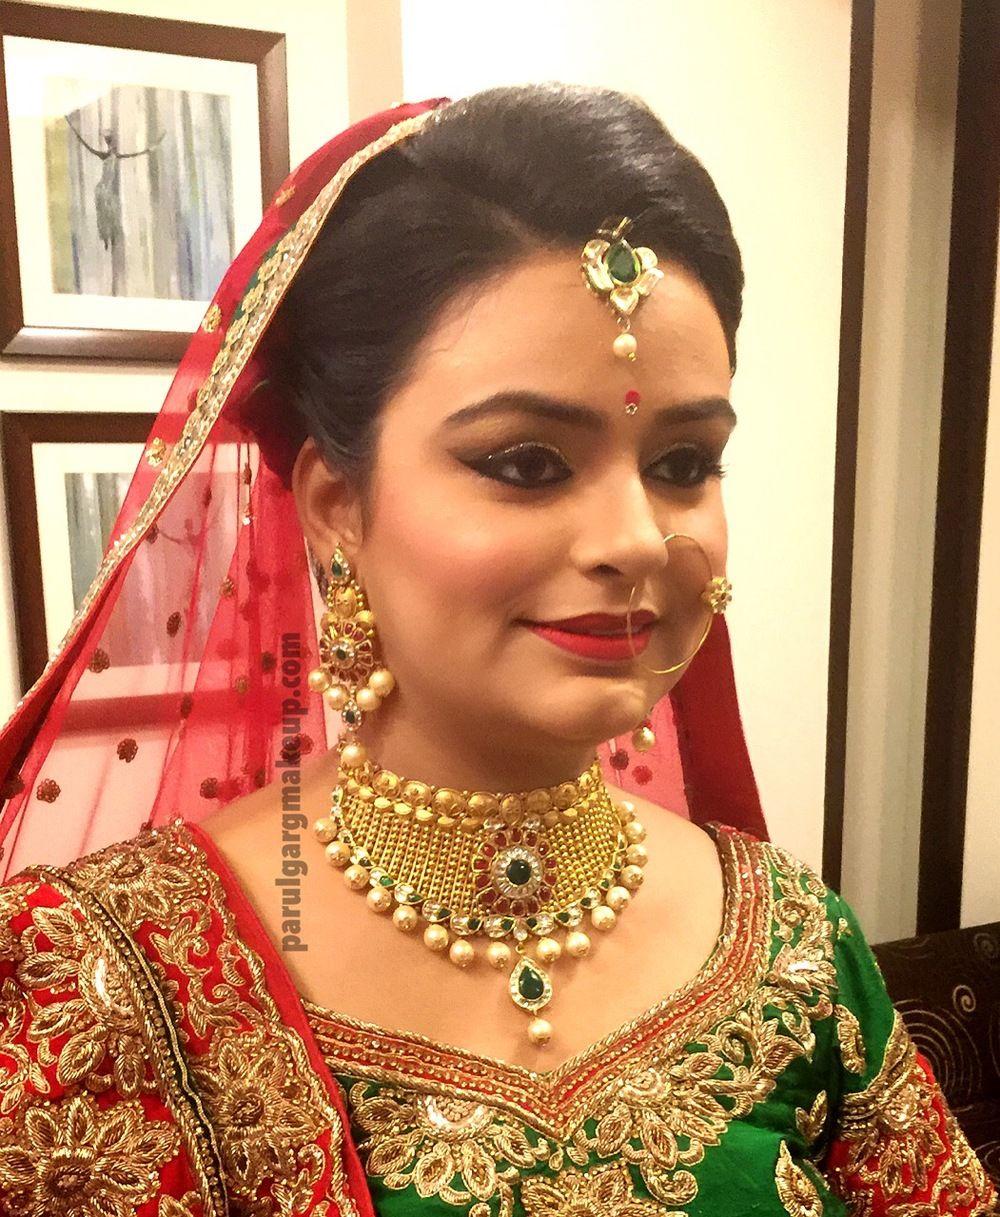 Best Freelance Makeup Artist in Delhi Freelance makeup